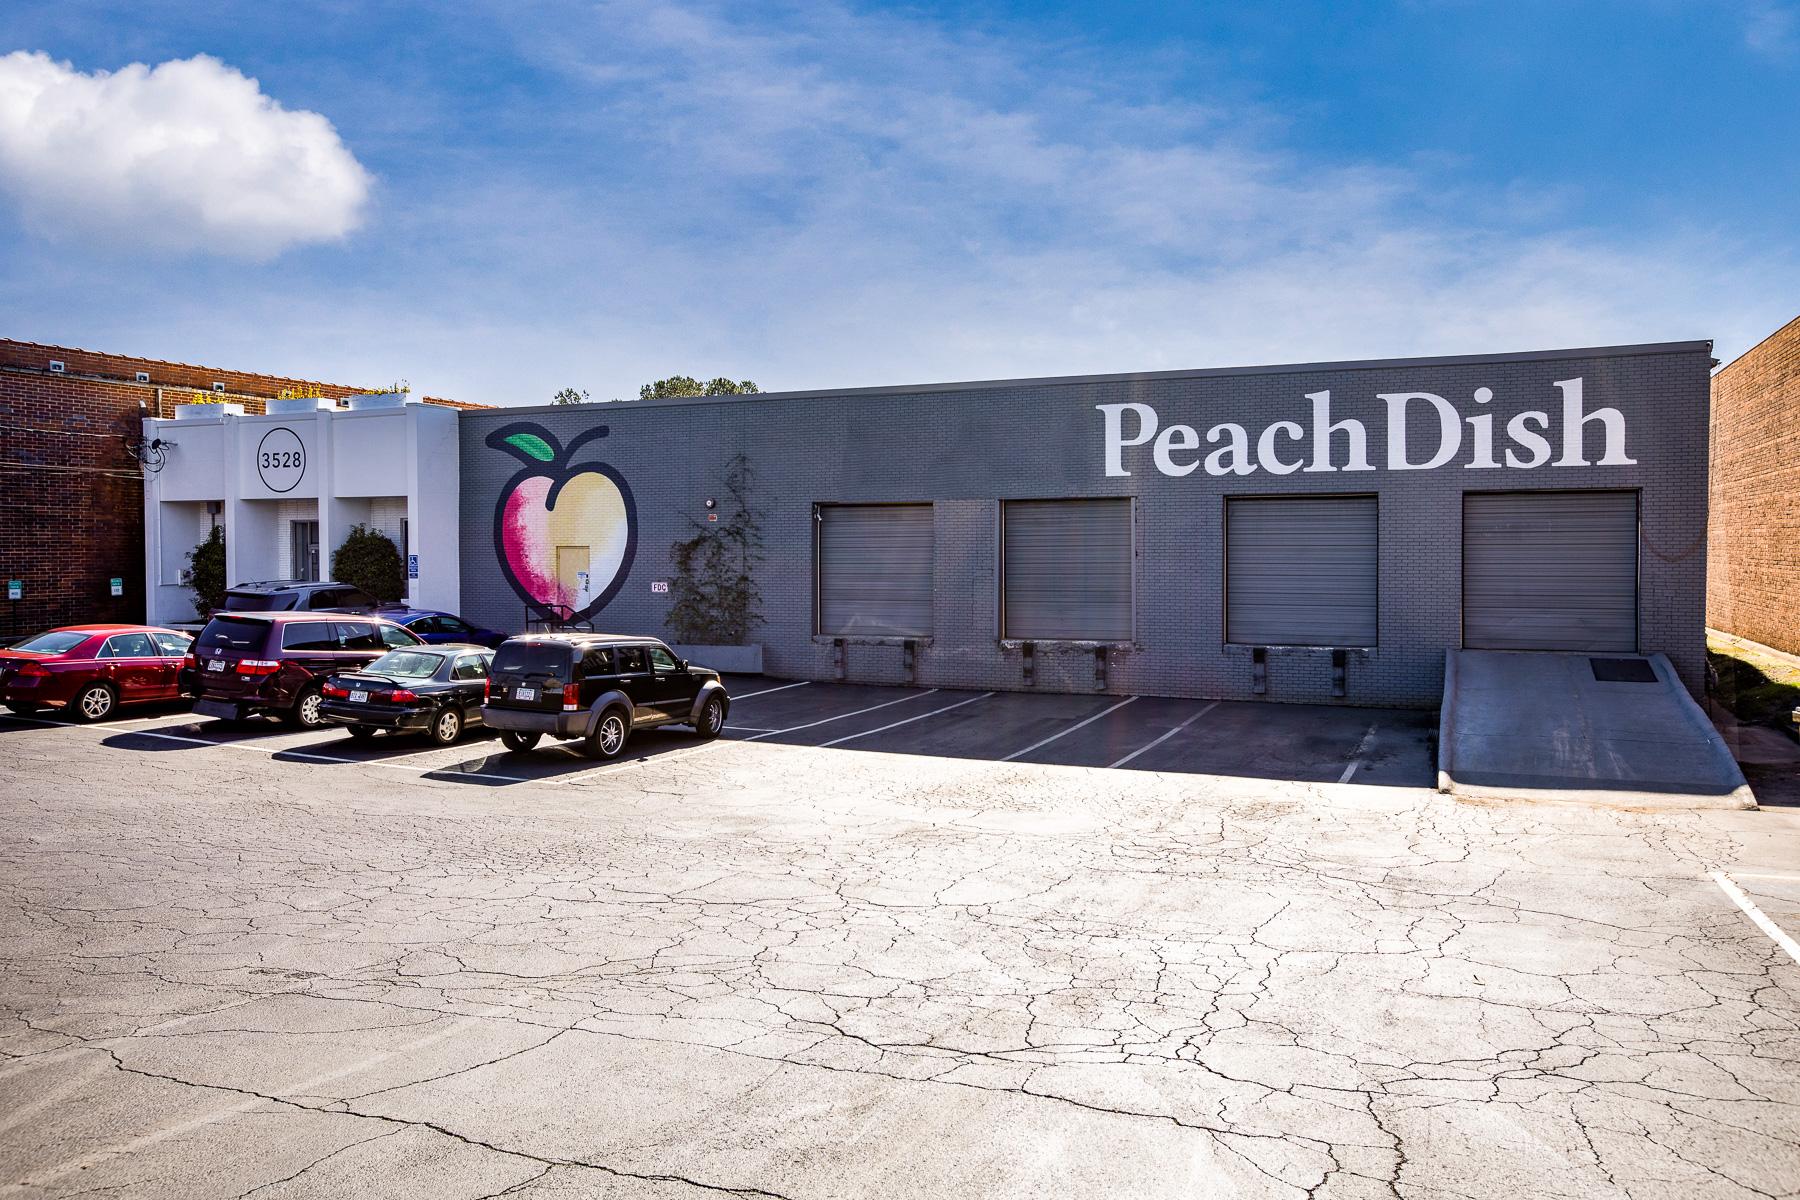 PEACHDISH-2.jpg